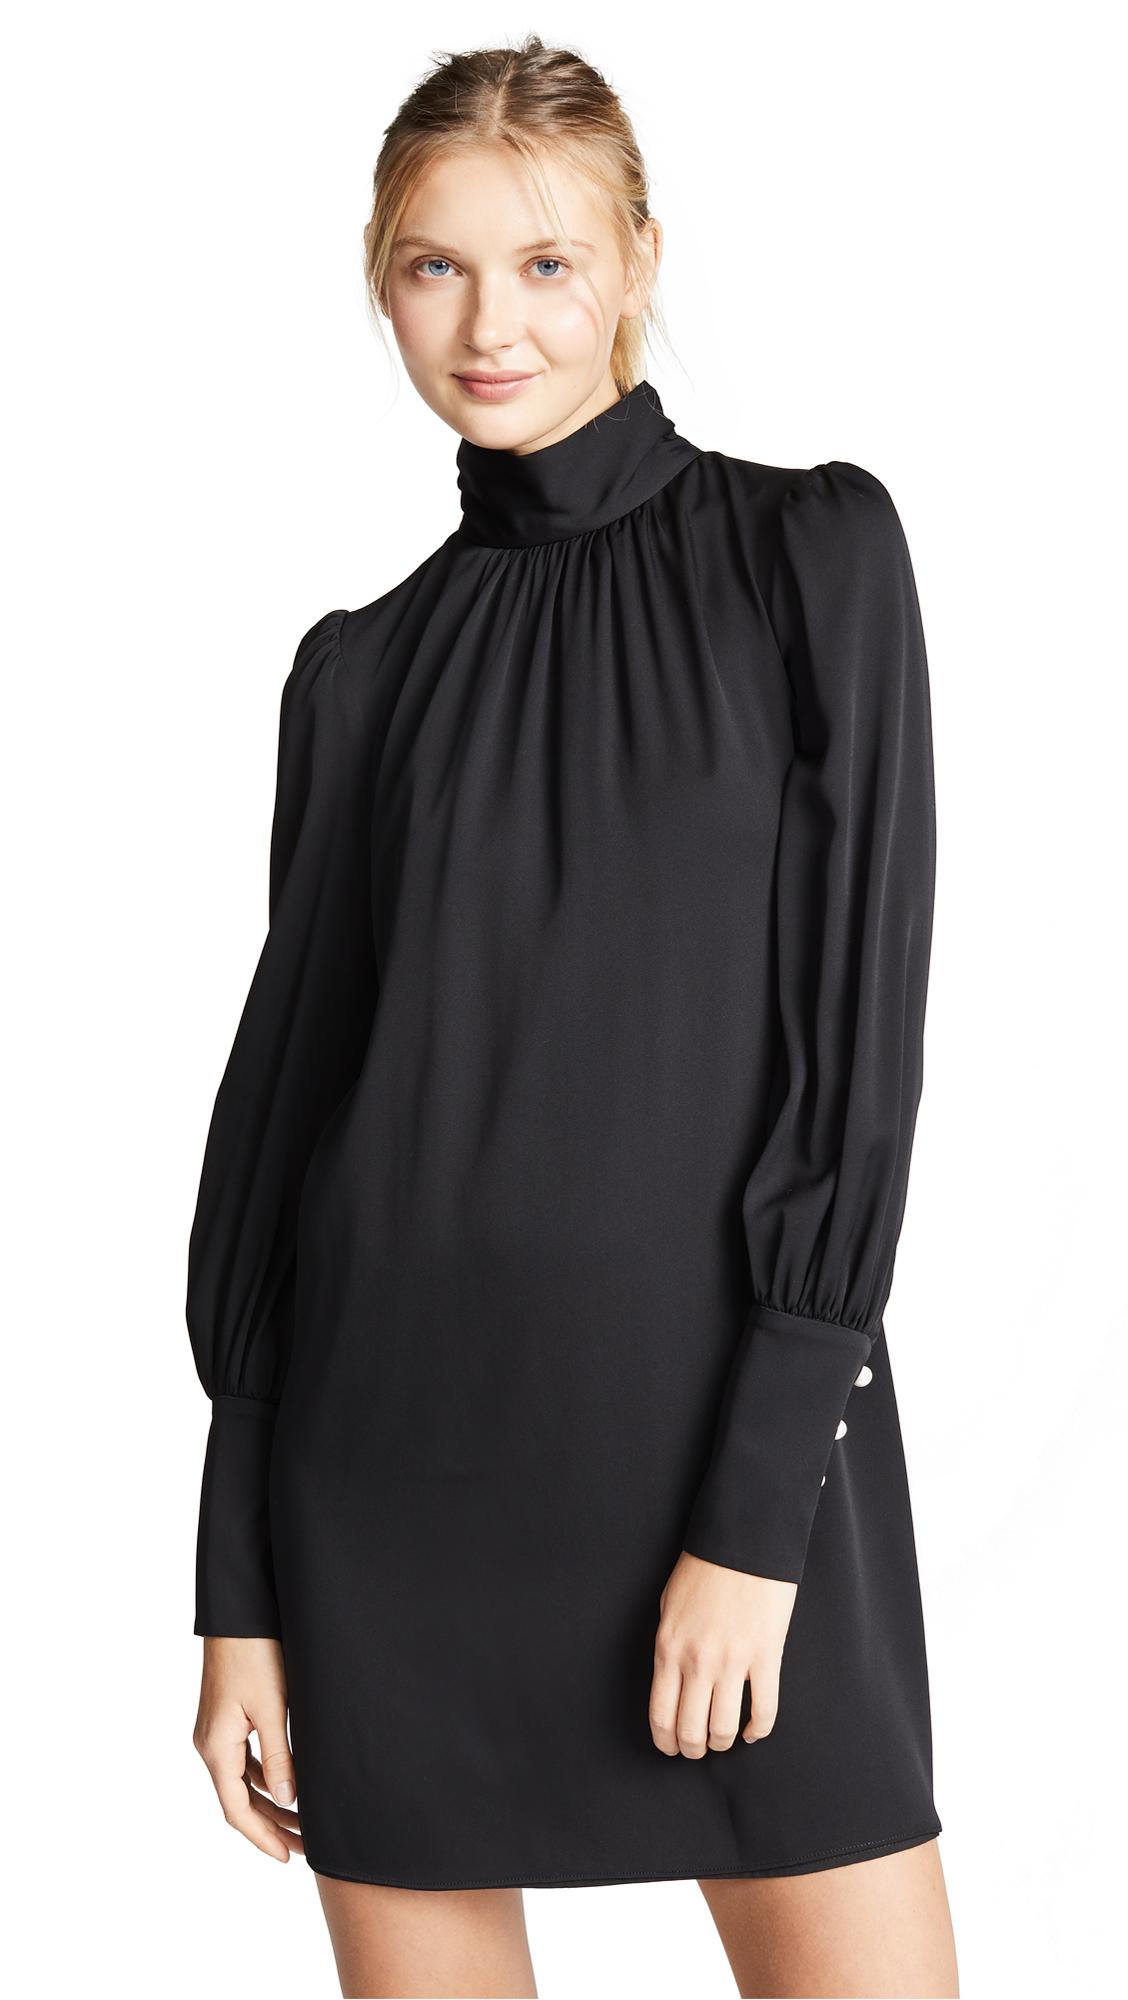 Milly Annabel Dress